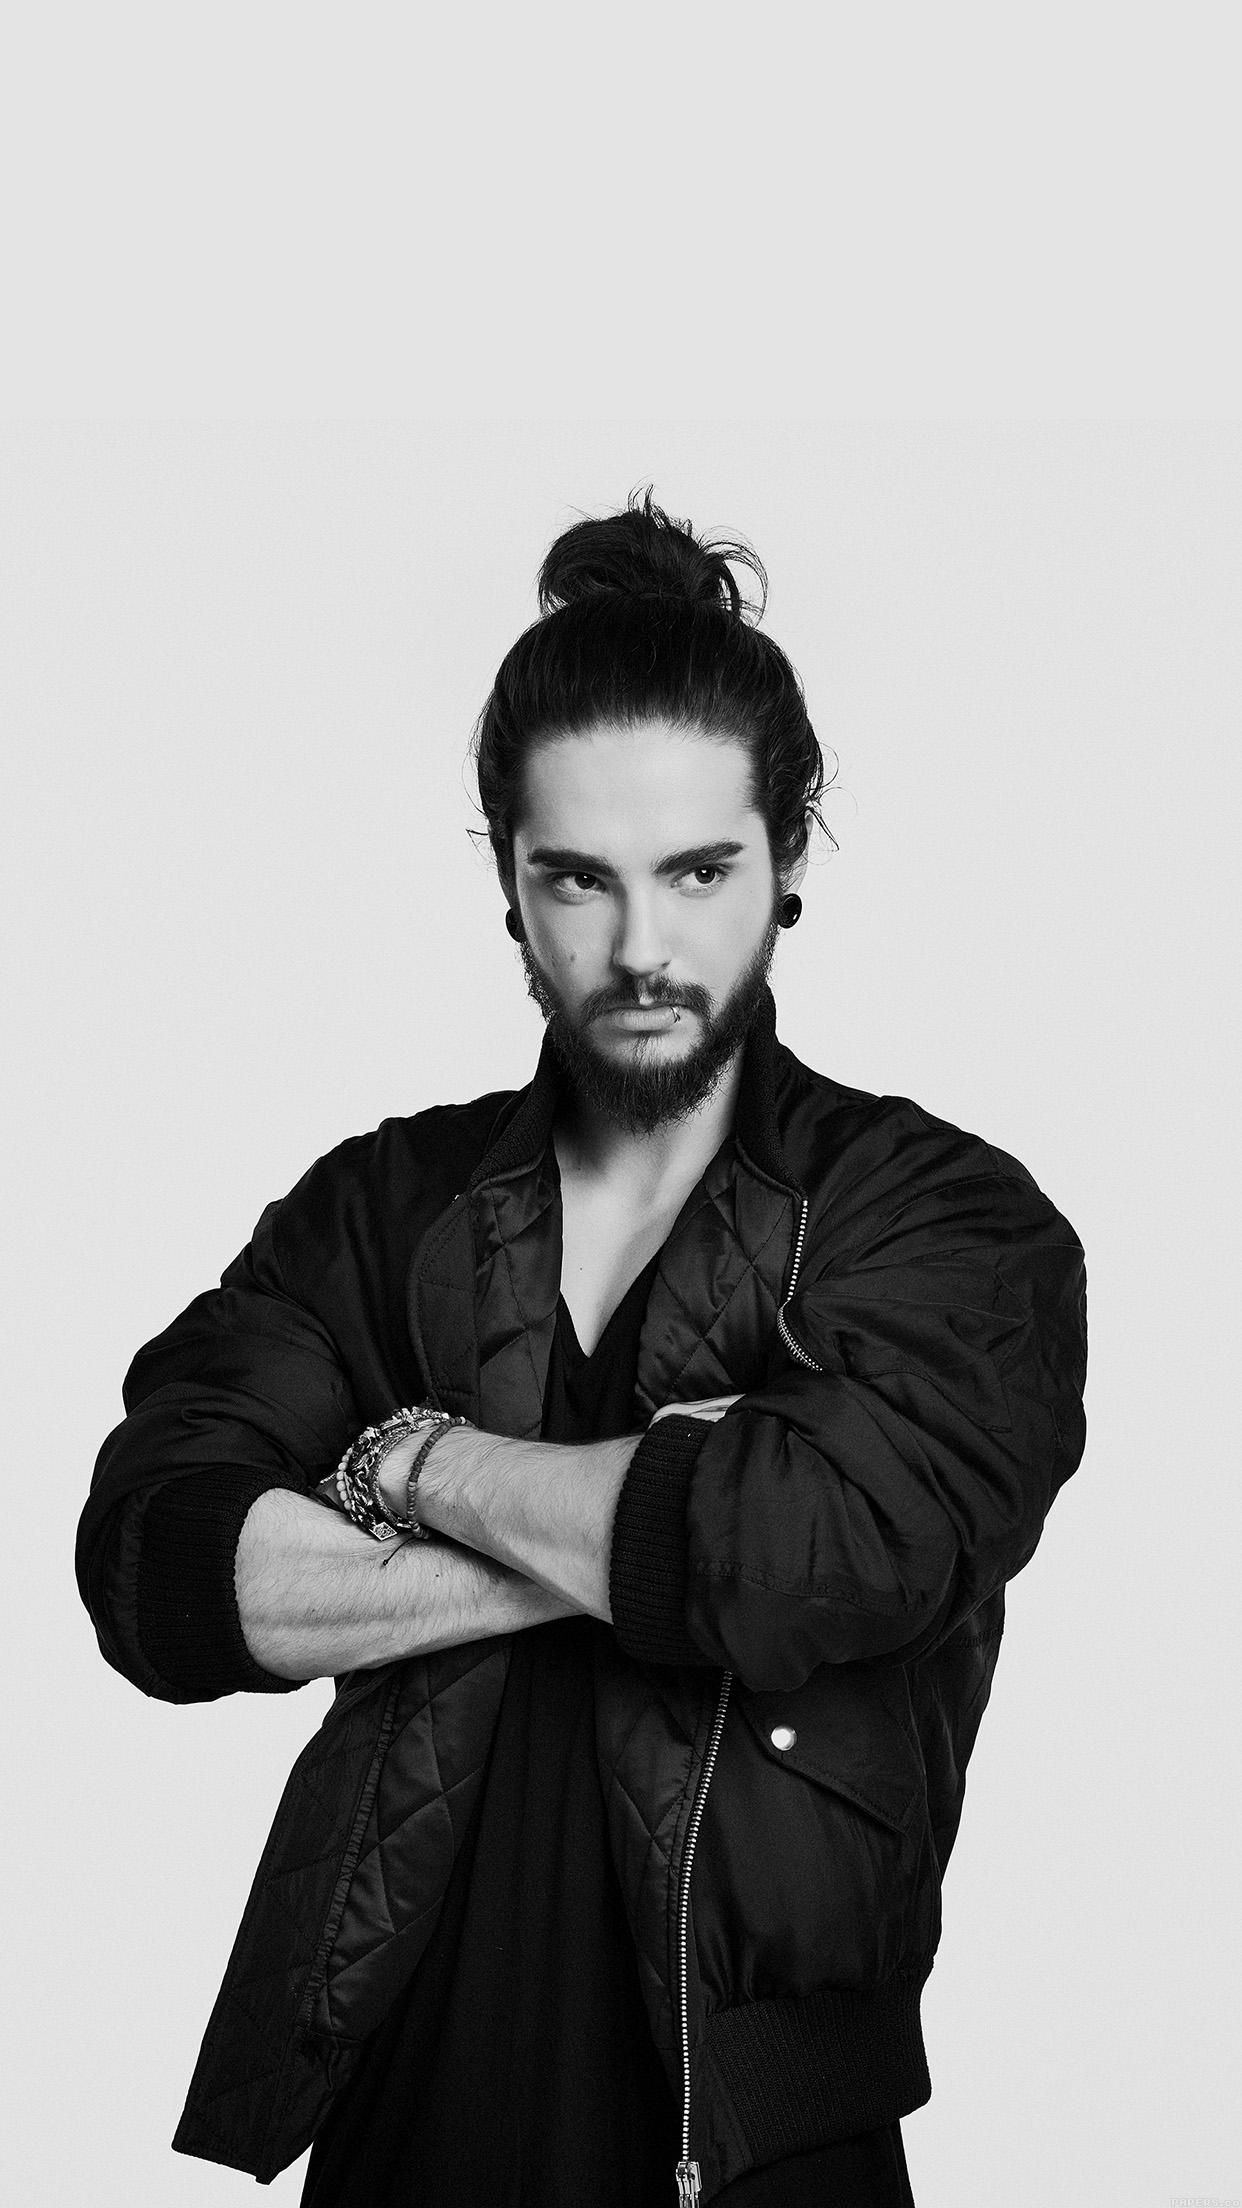 Cute Butterfly Phone Wallpapers Hd79 Tokio Hotel German Pop Rock Band Music Celebrity